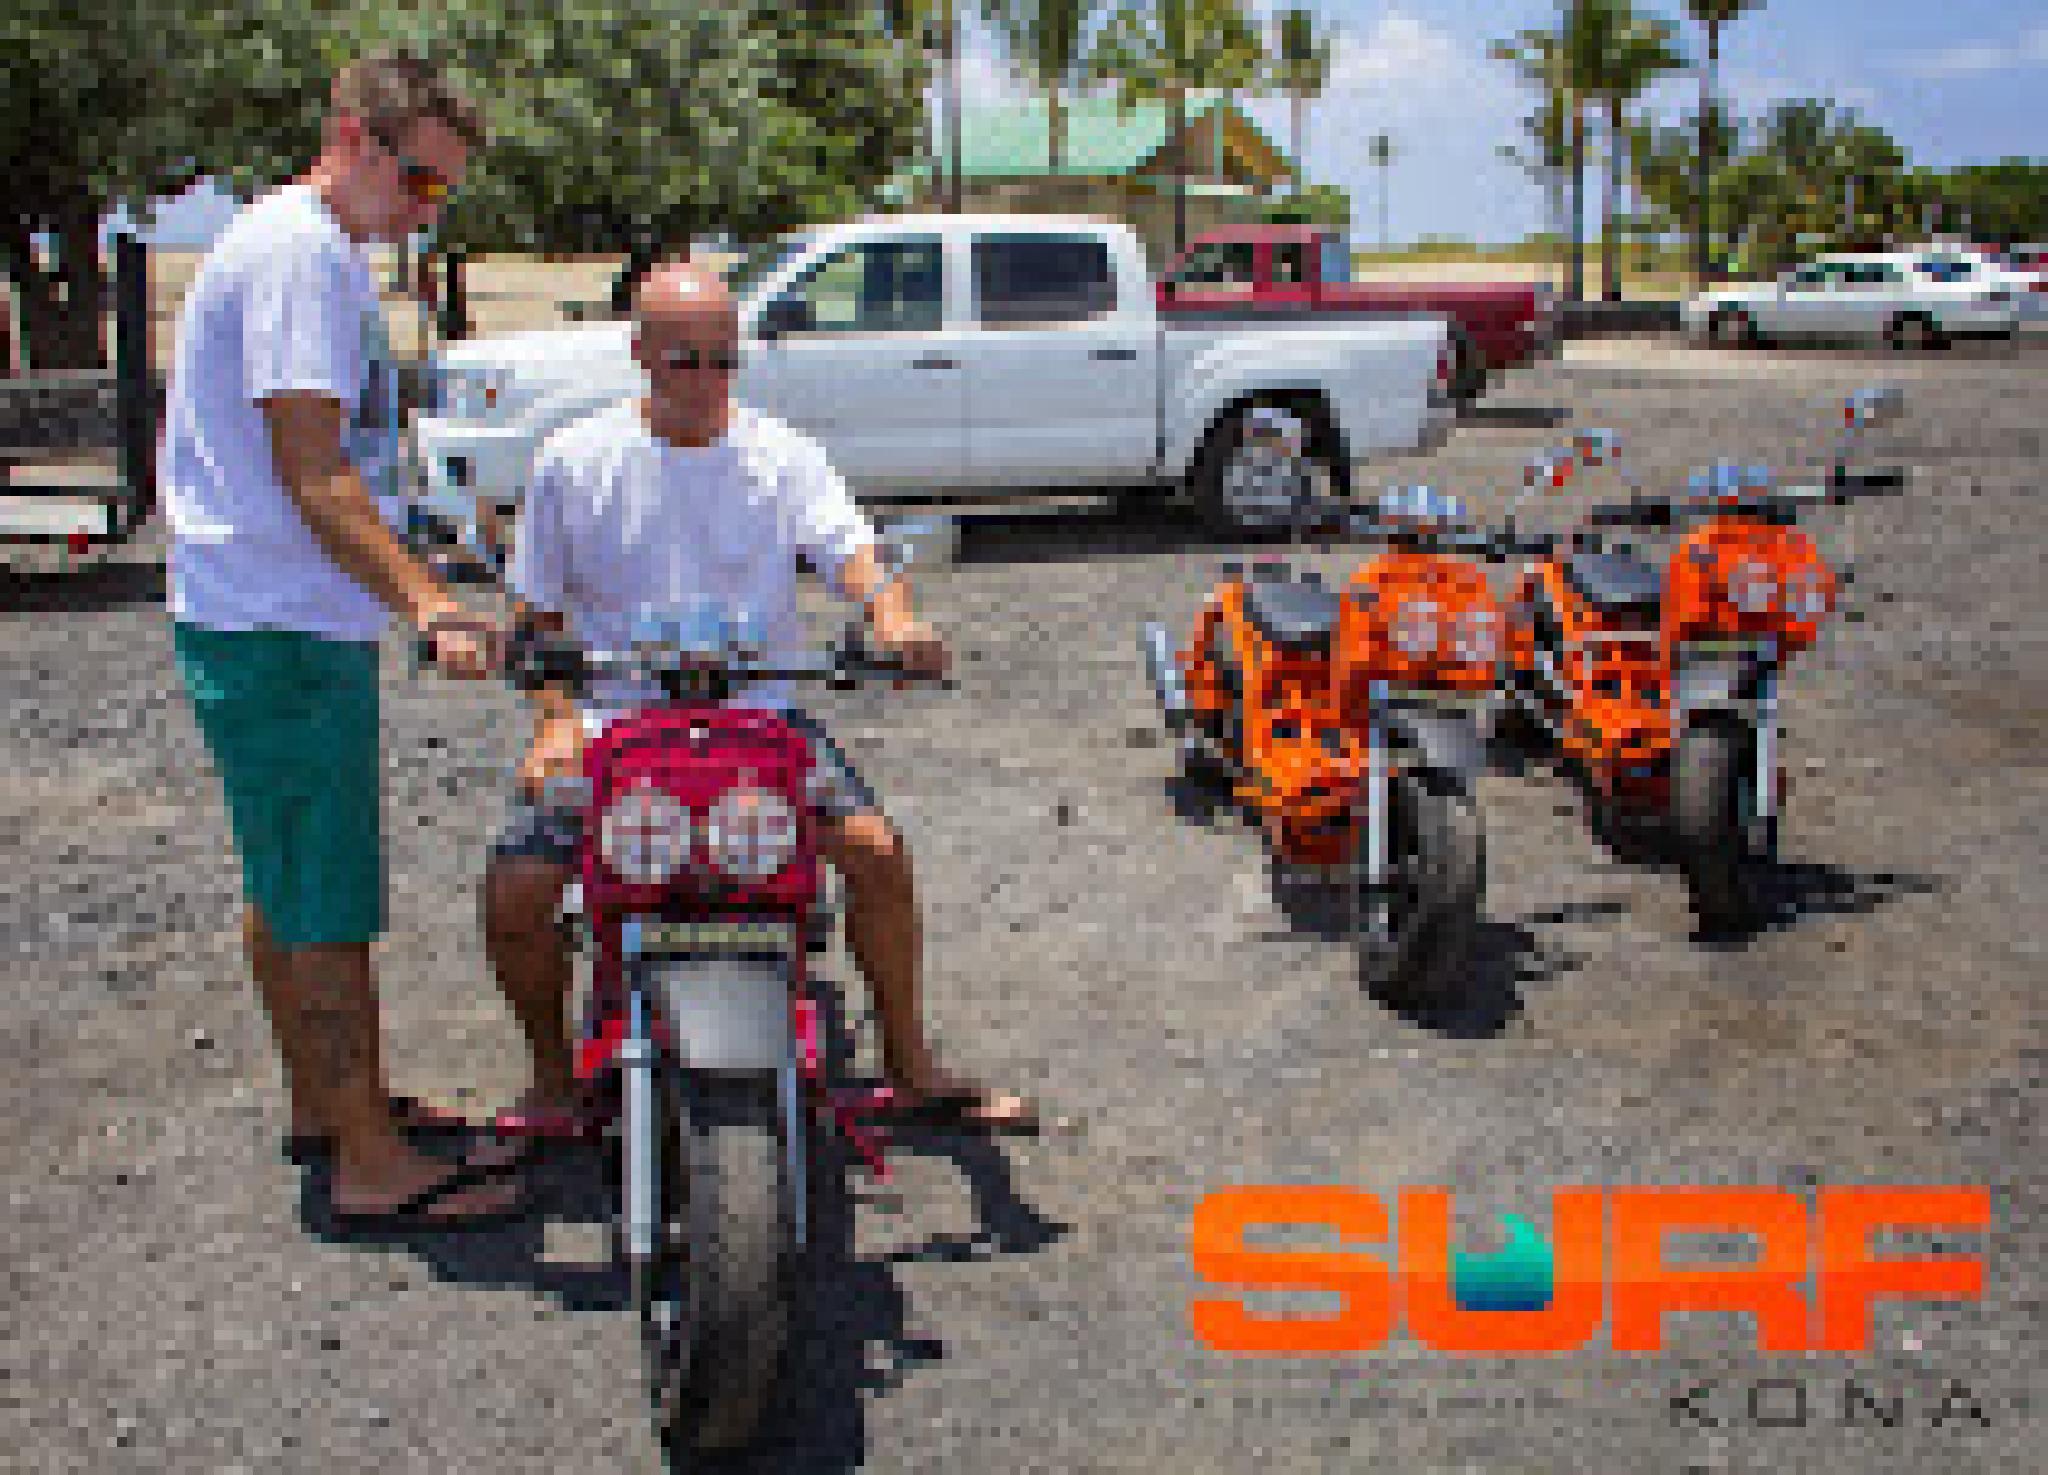 Moped rentals oahu by surfkonacom